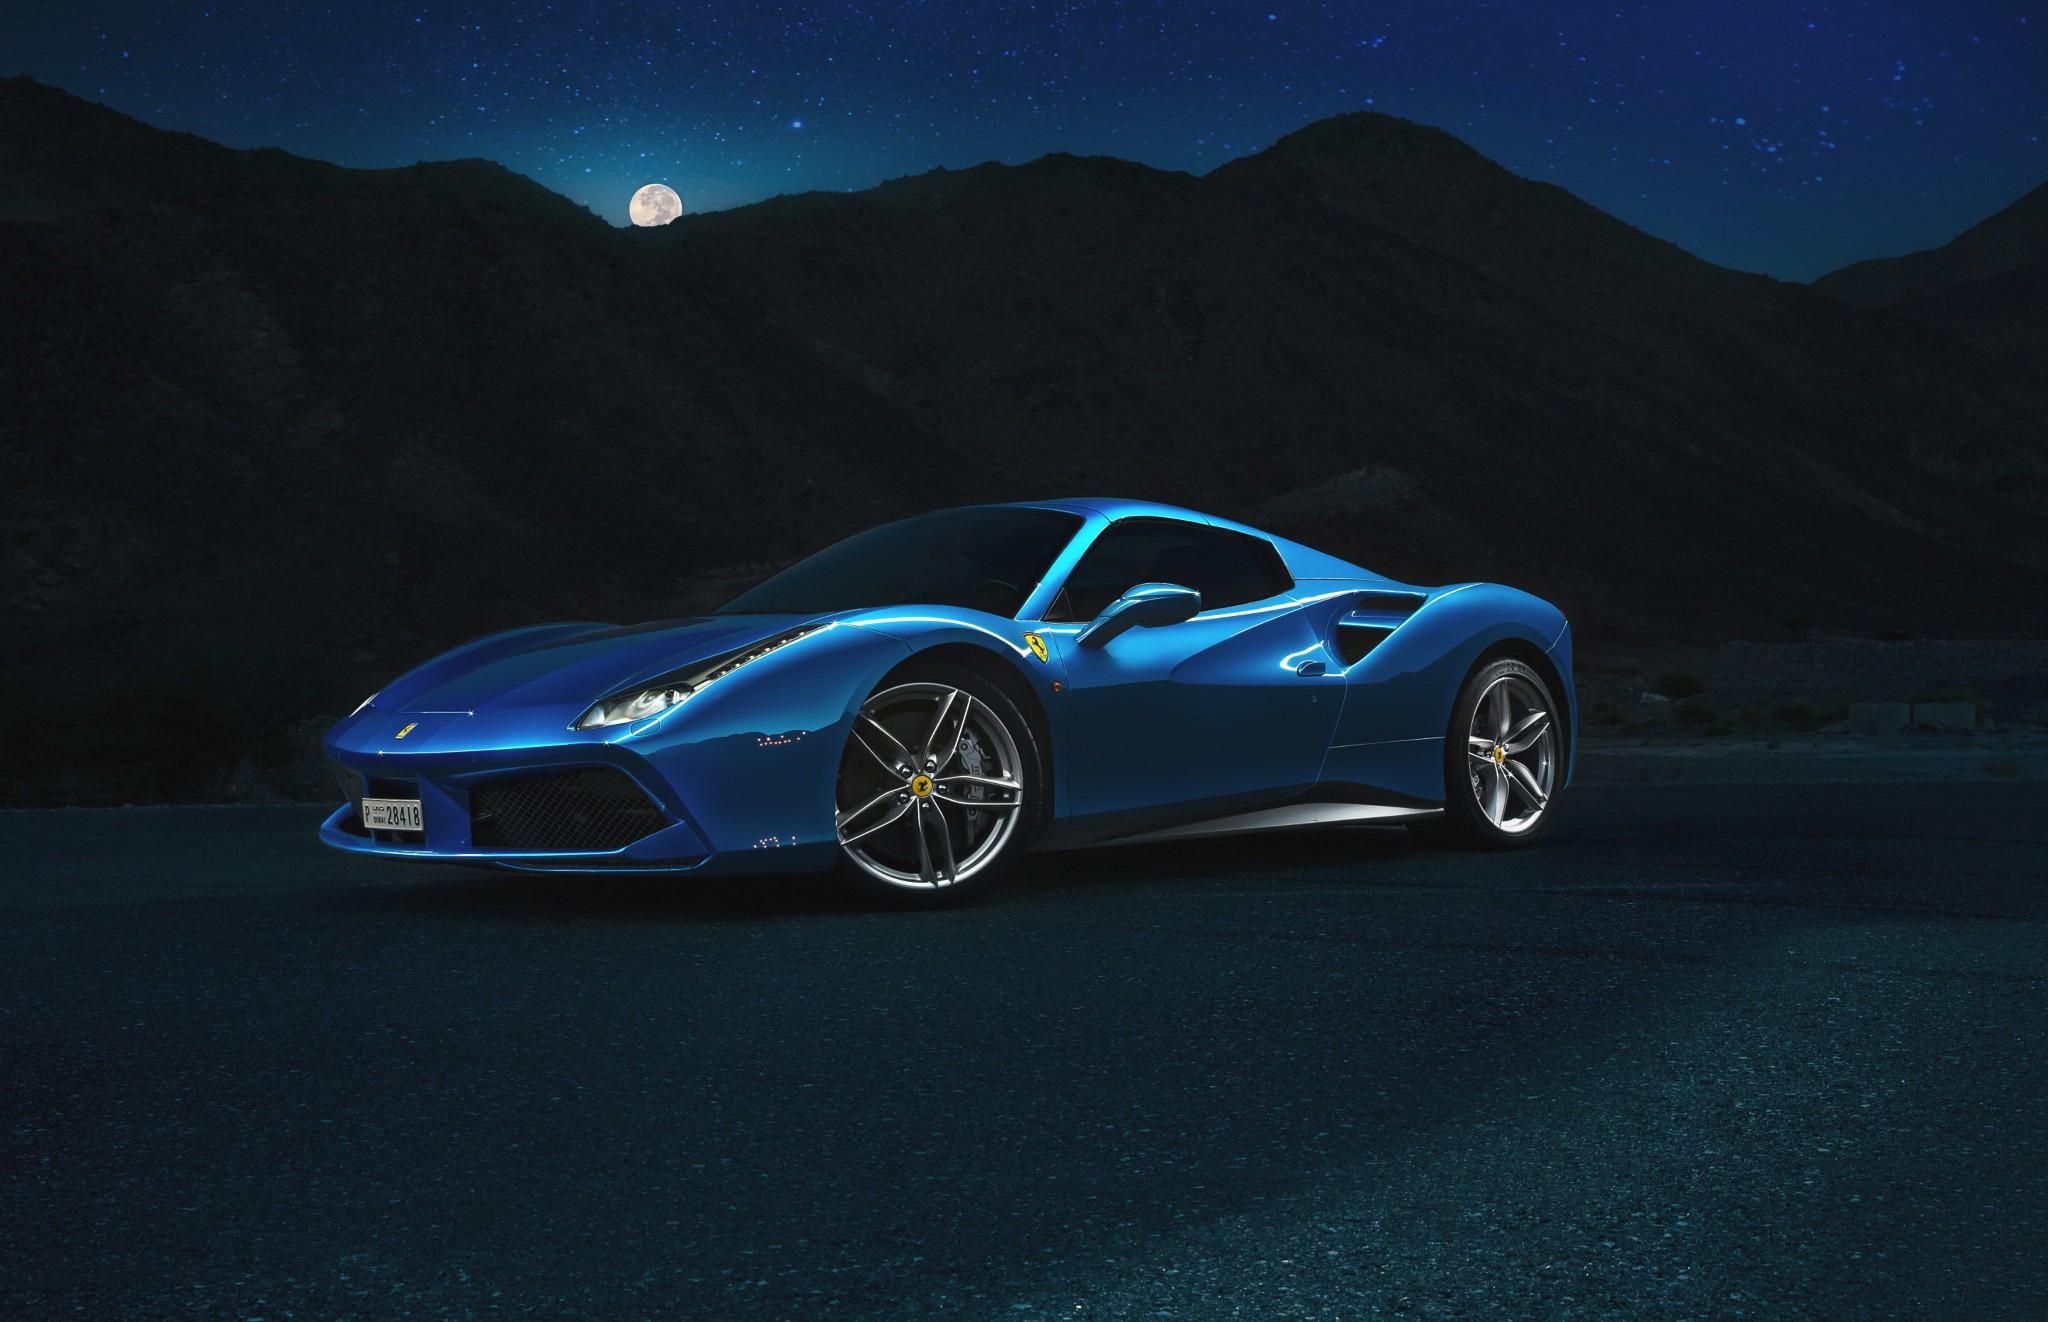 Wallpaper Blue Cars Sports Car Coupe Performance Car Ferrari